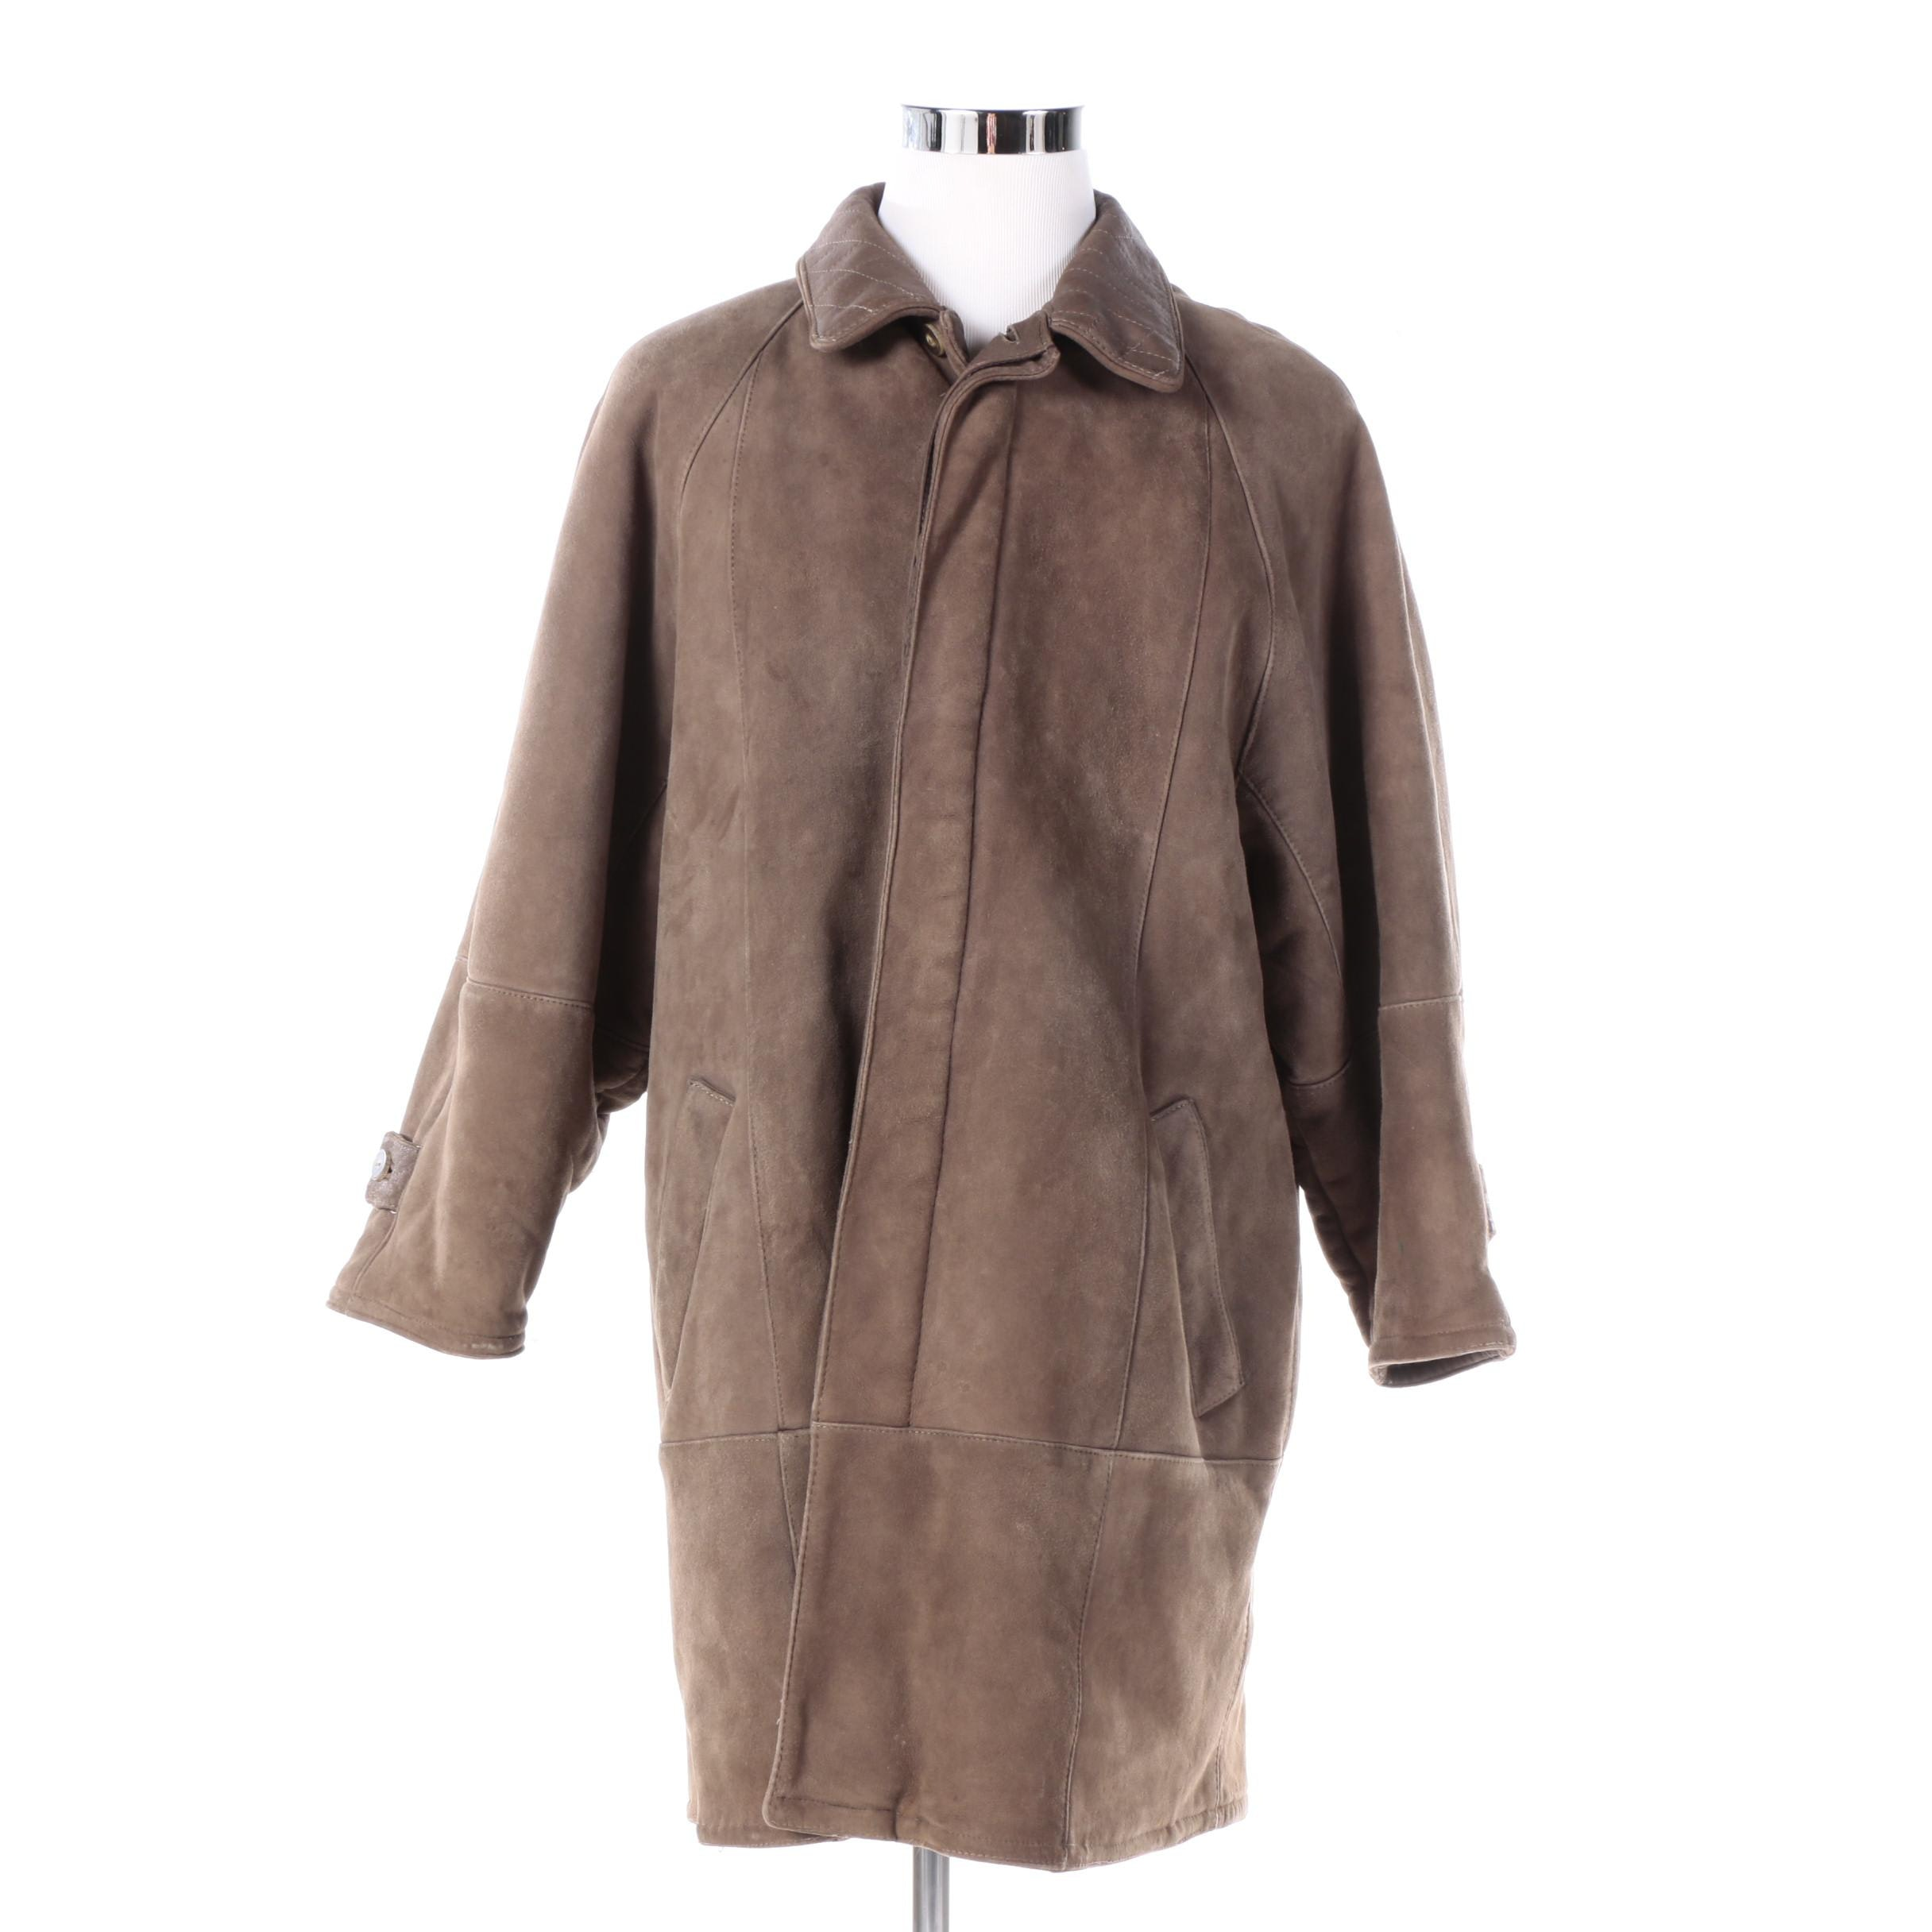 Men's Brown Suede Barn Coat with Lamb Fur Lining